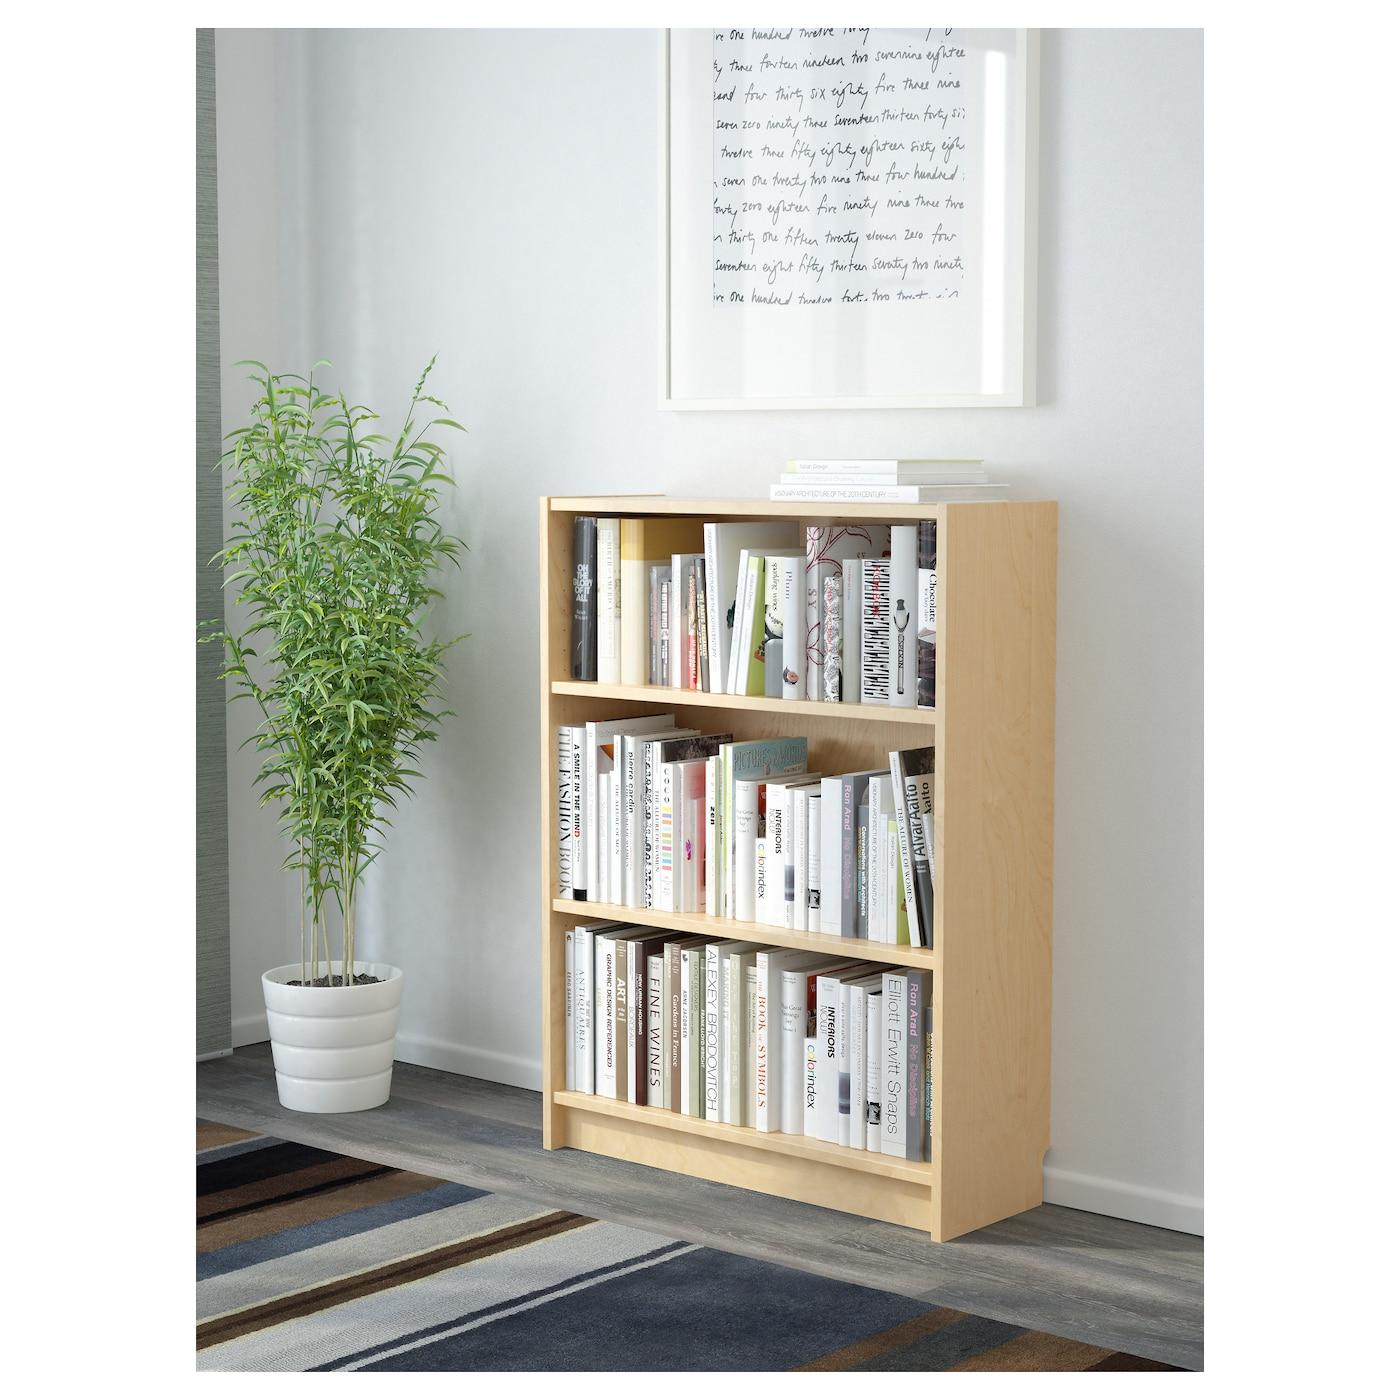 billy biblioth que plaqu bouleau 80 x 28 x 106 cm ikea. Black Bedroom Furniture Sets. Home Design Ideas